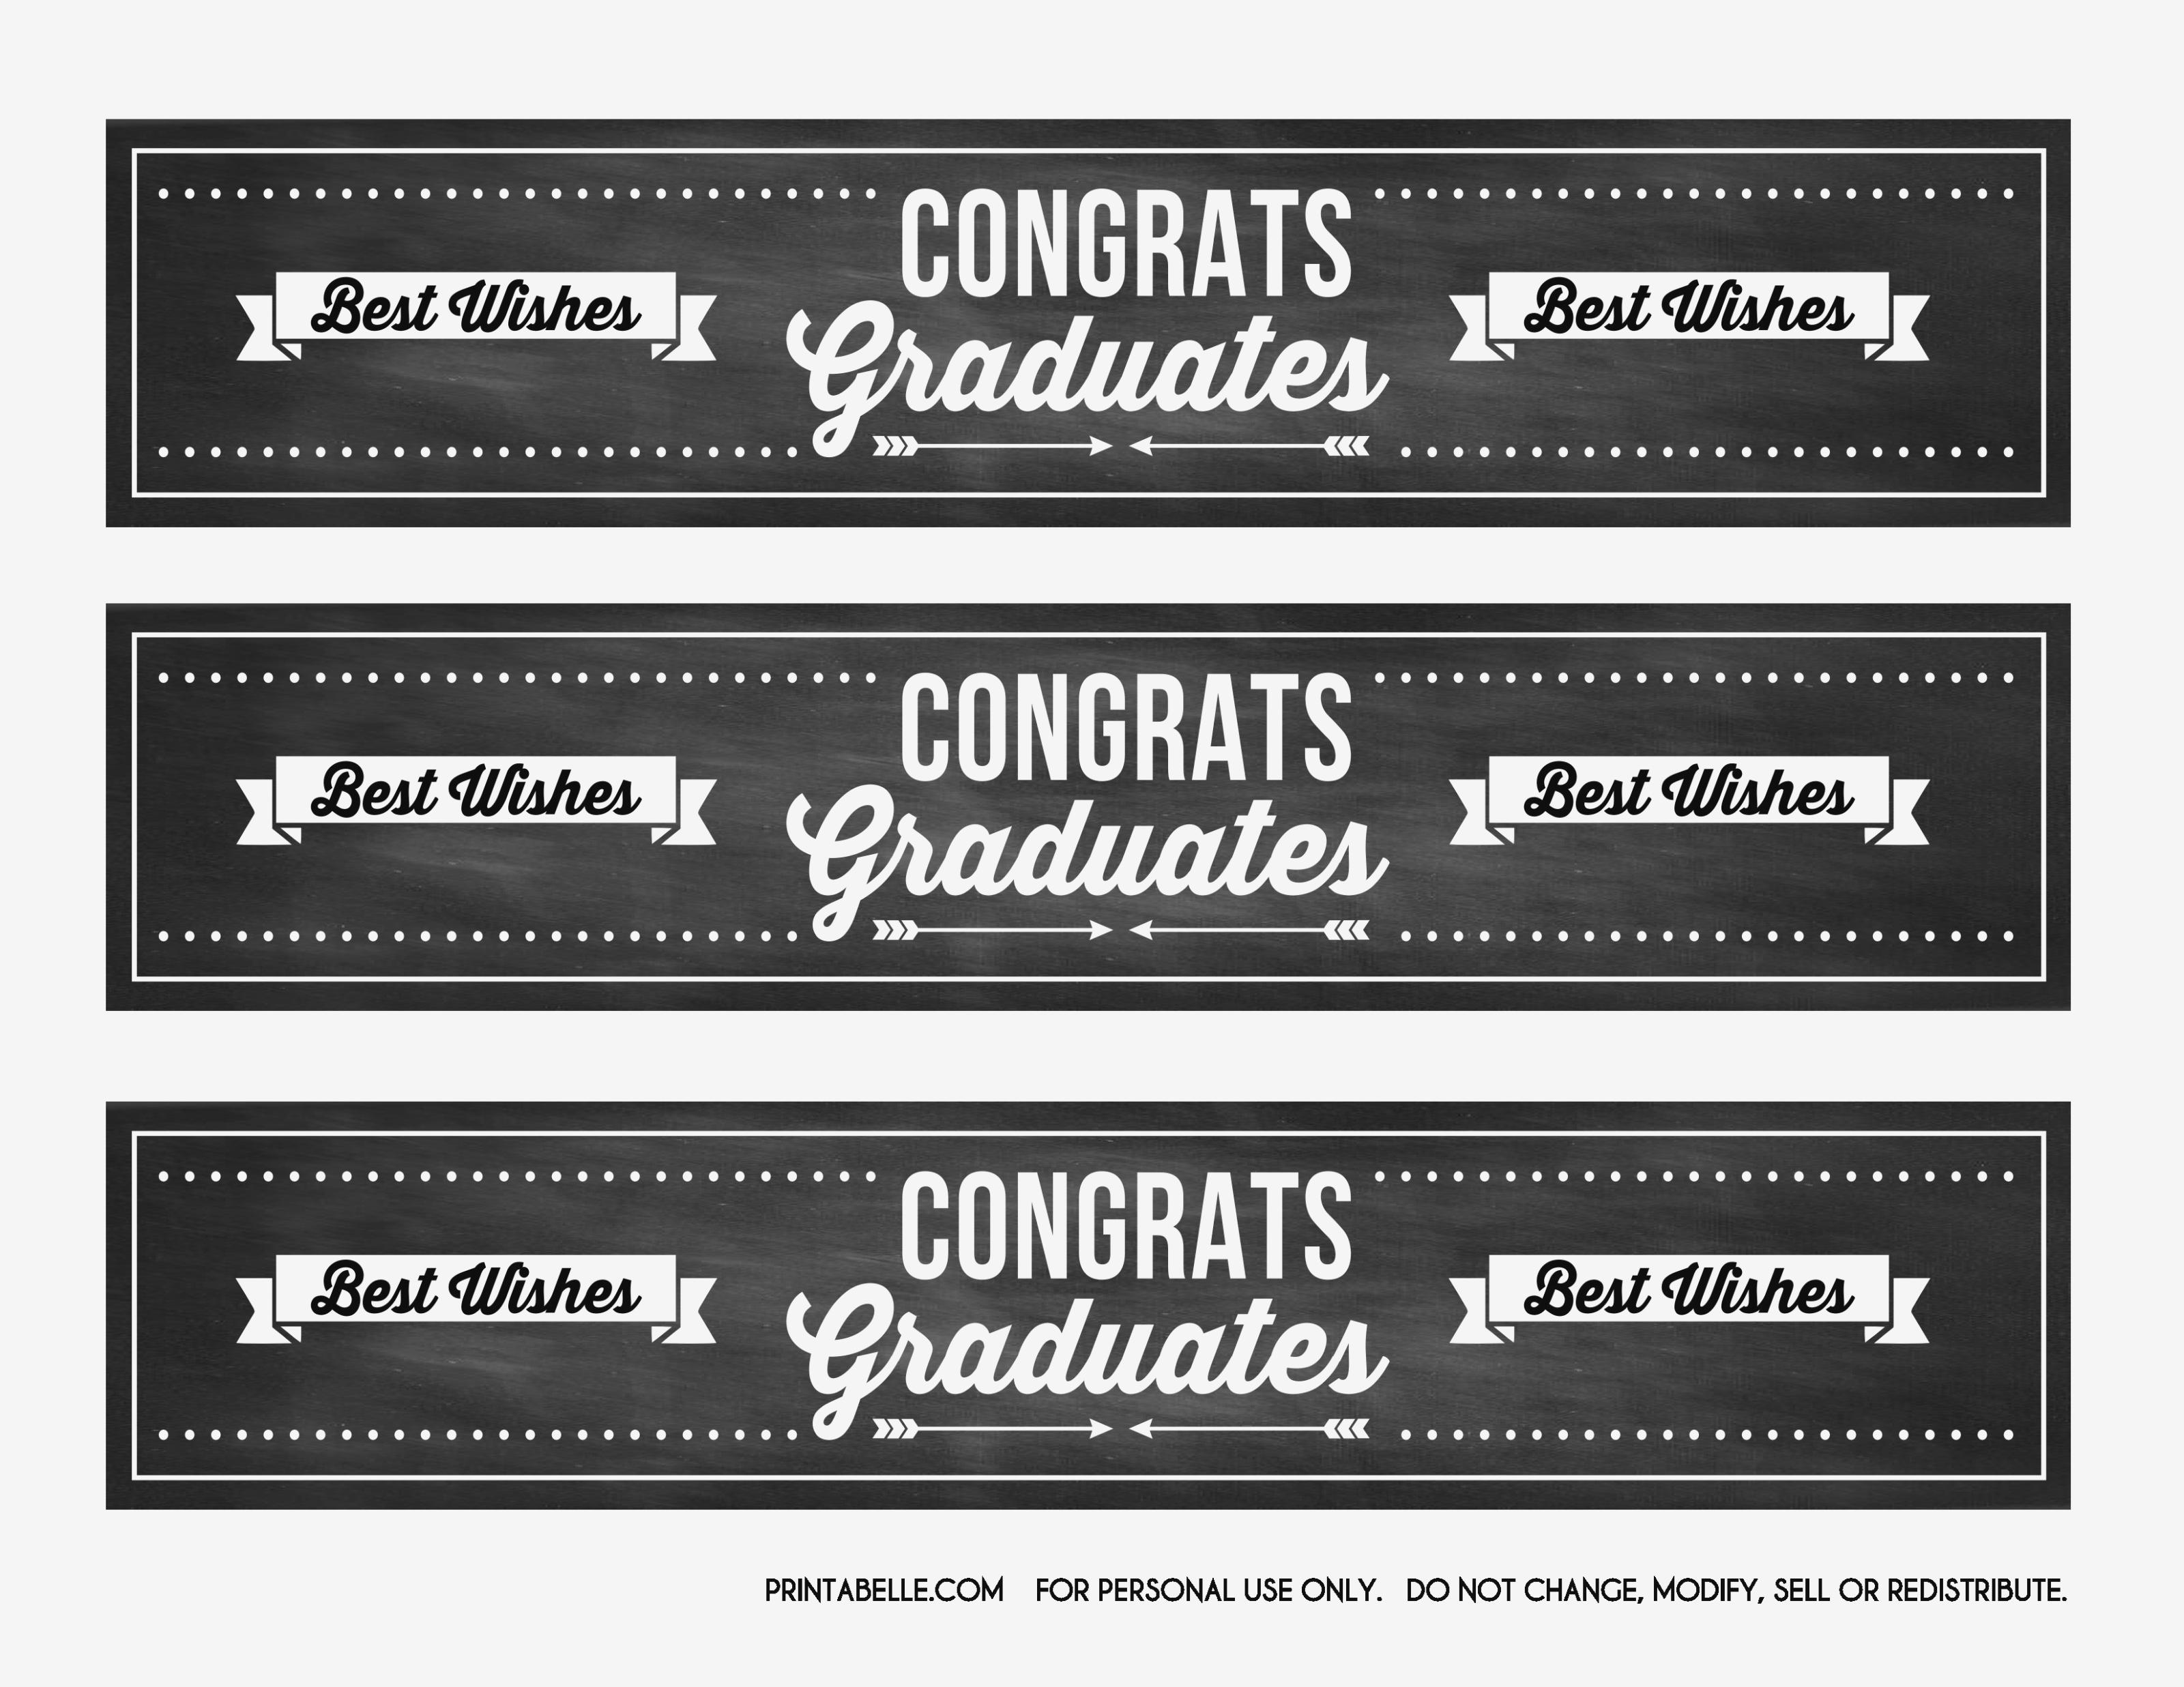 Free Printable Label Templates 15 | Printable And Formats - Free Printable Graduation Address Labels